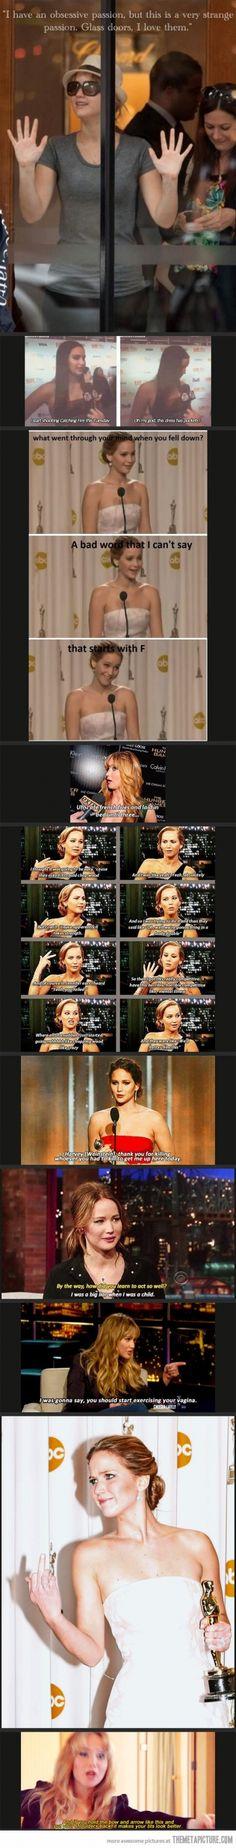 Love me some Jennifer Lawrence